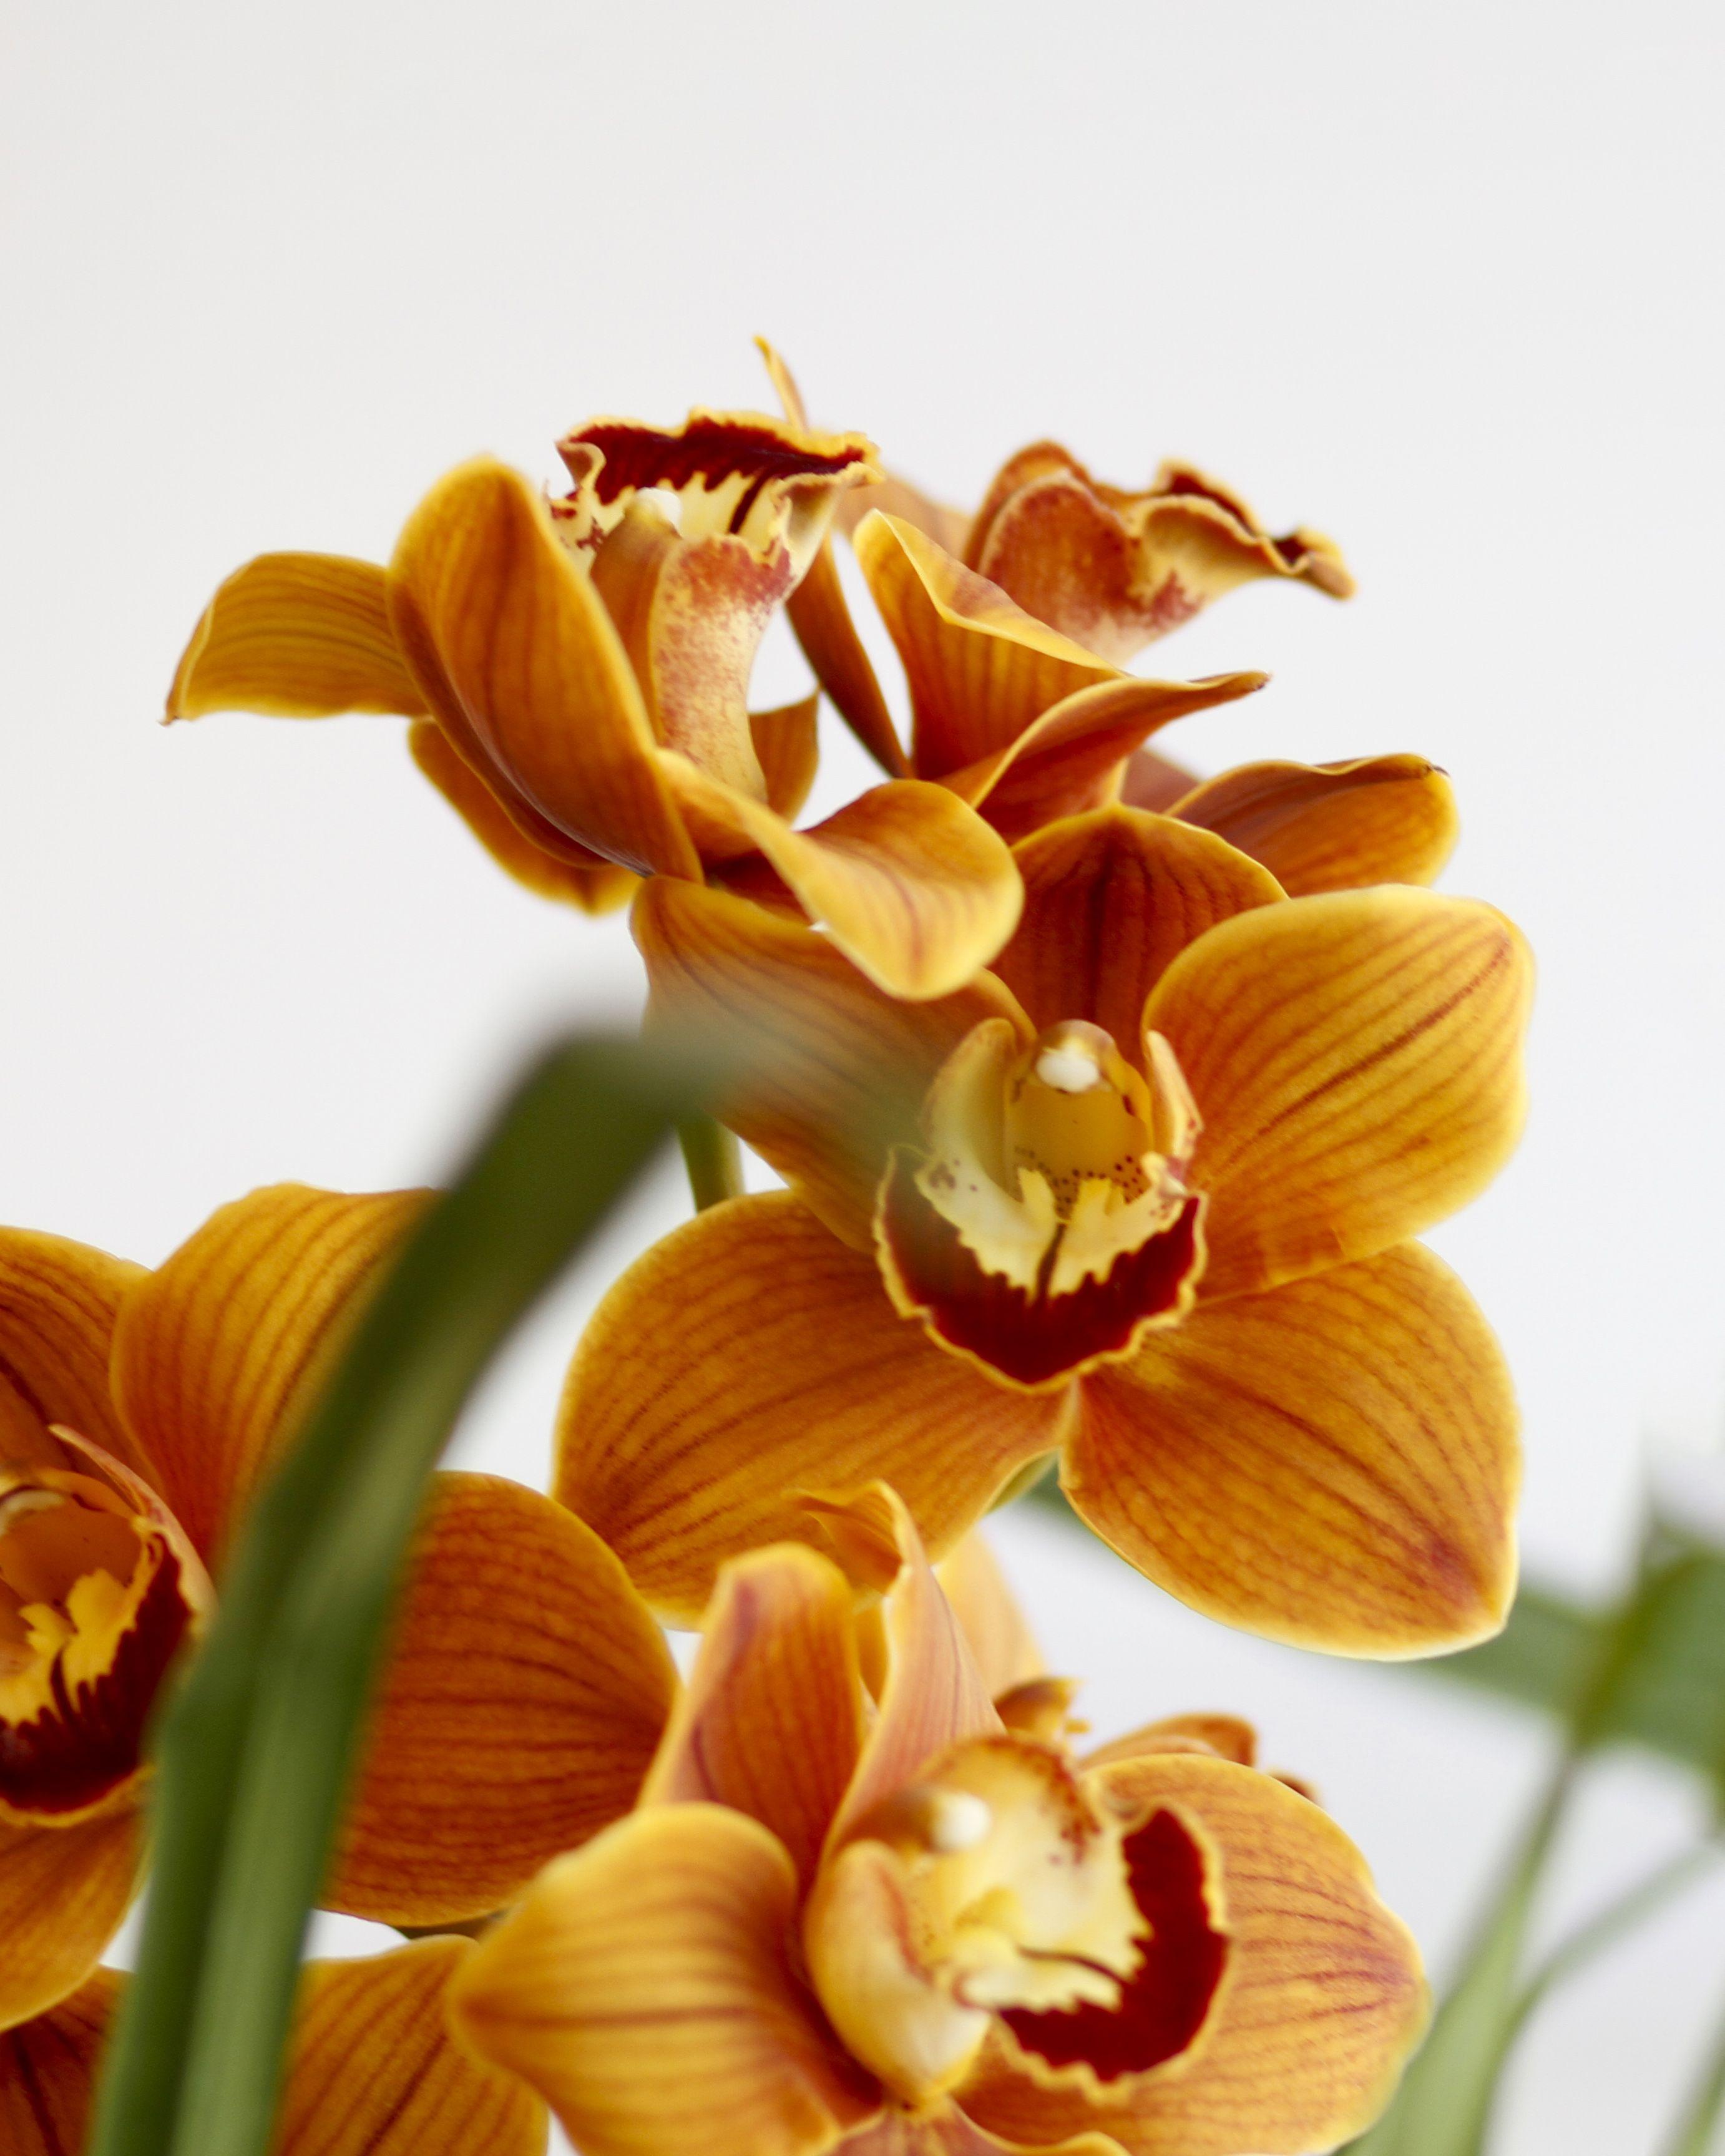 Fall Cymbidium Orchids Cymbidium Orchids Orchids Fast Flowers